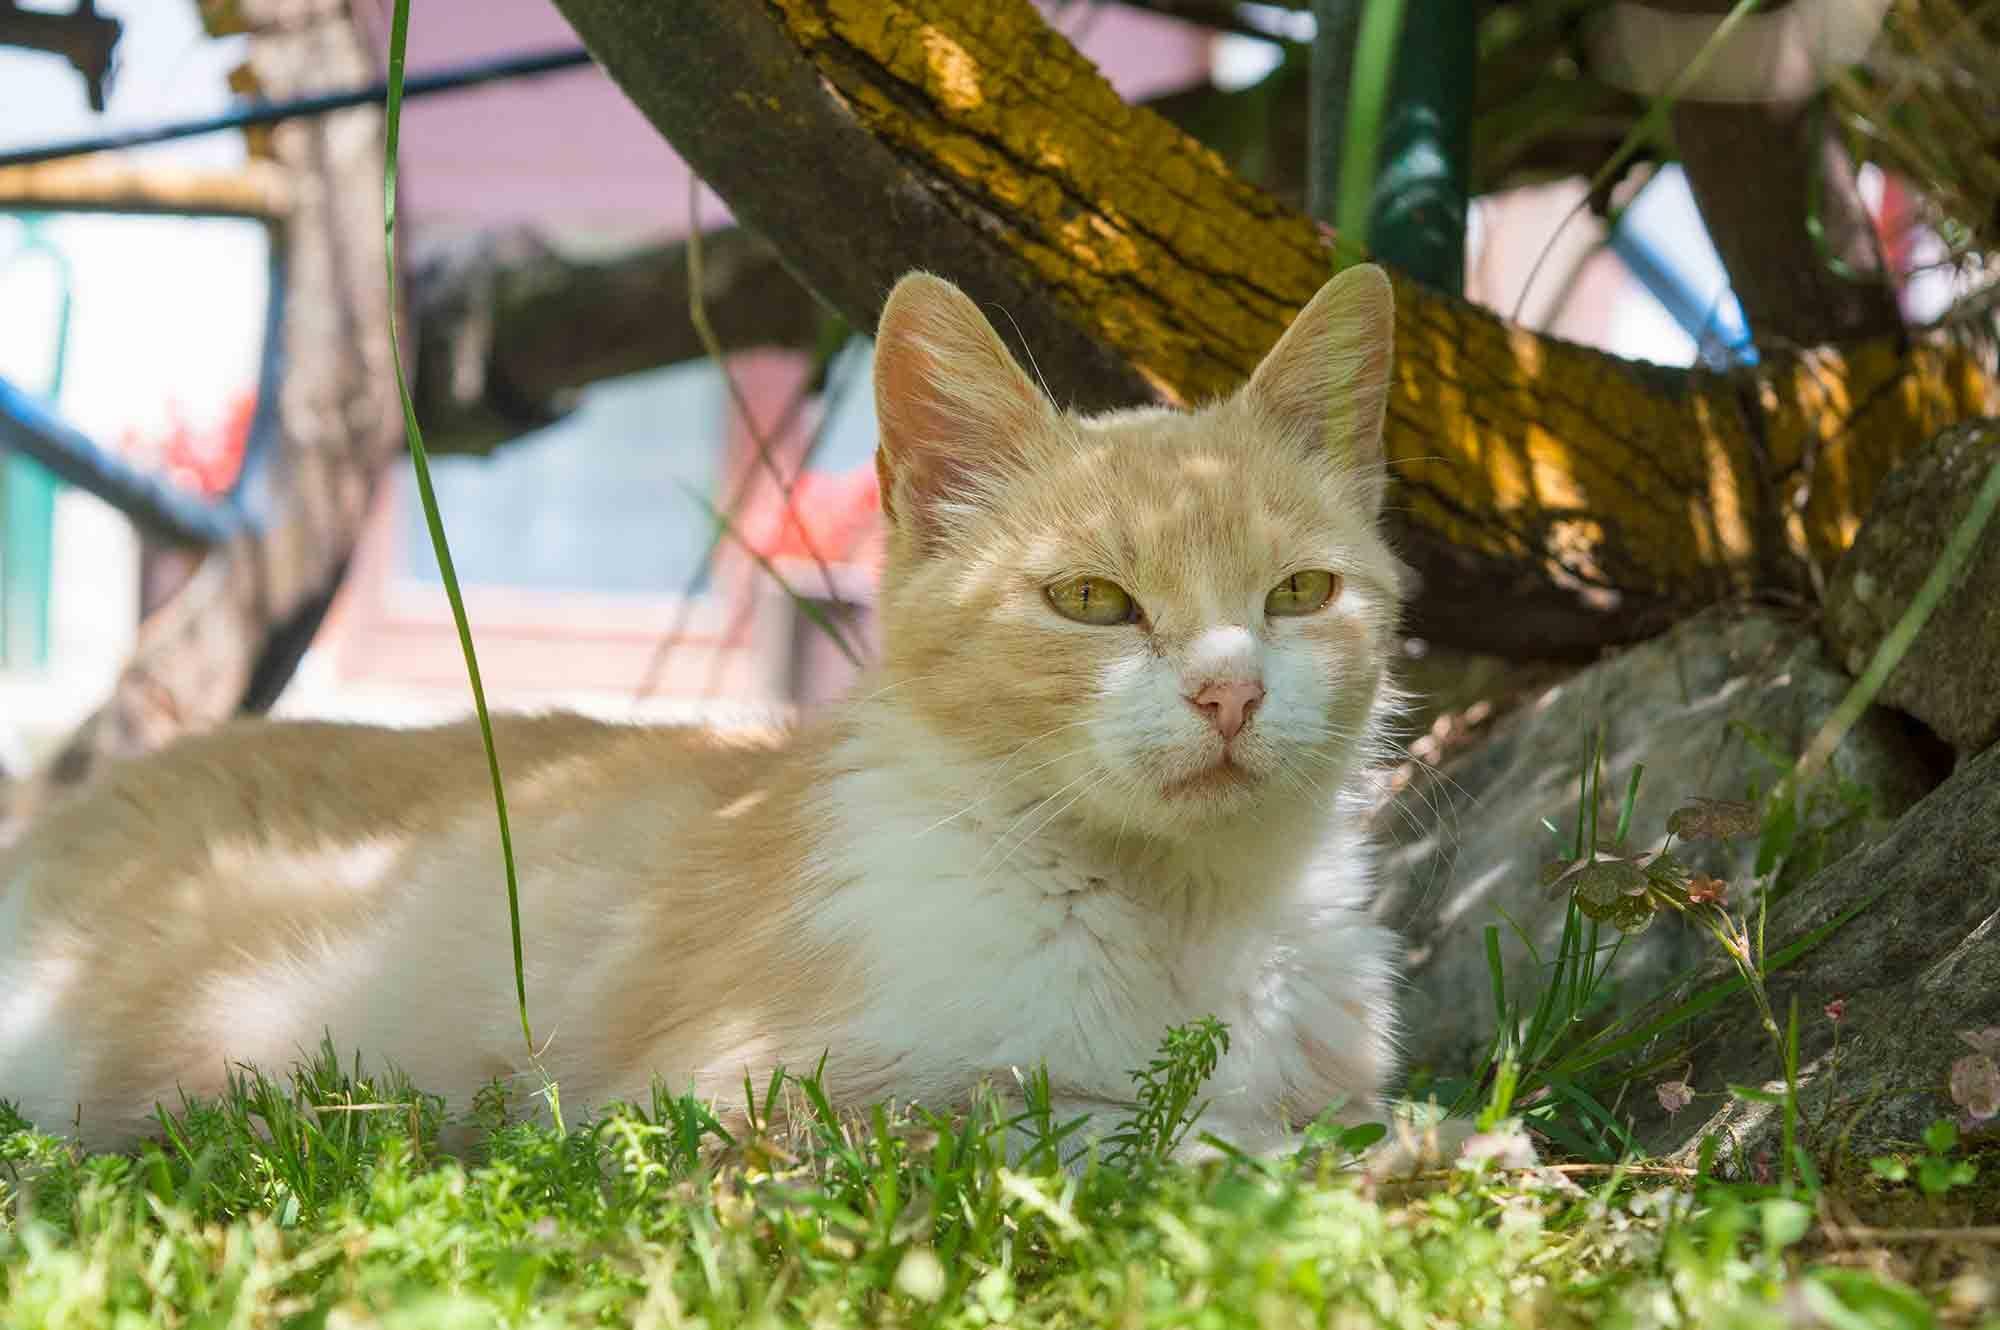 senior pets have special pet health considerations; ask a veterinarian